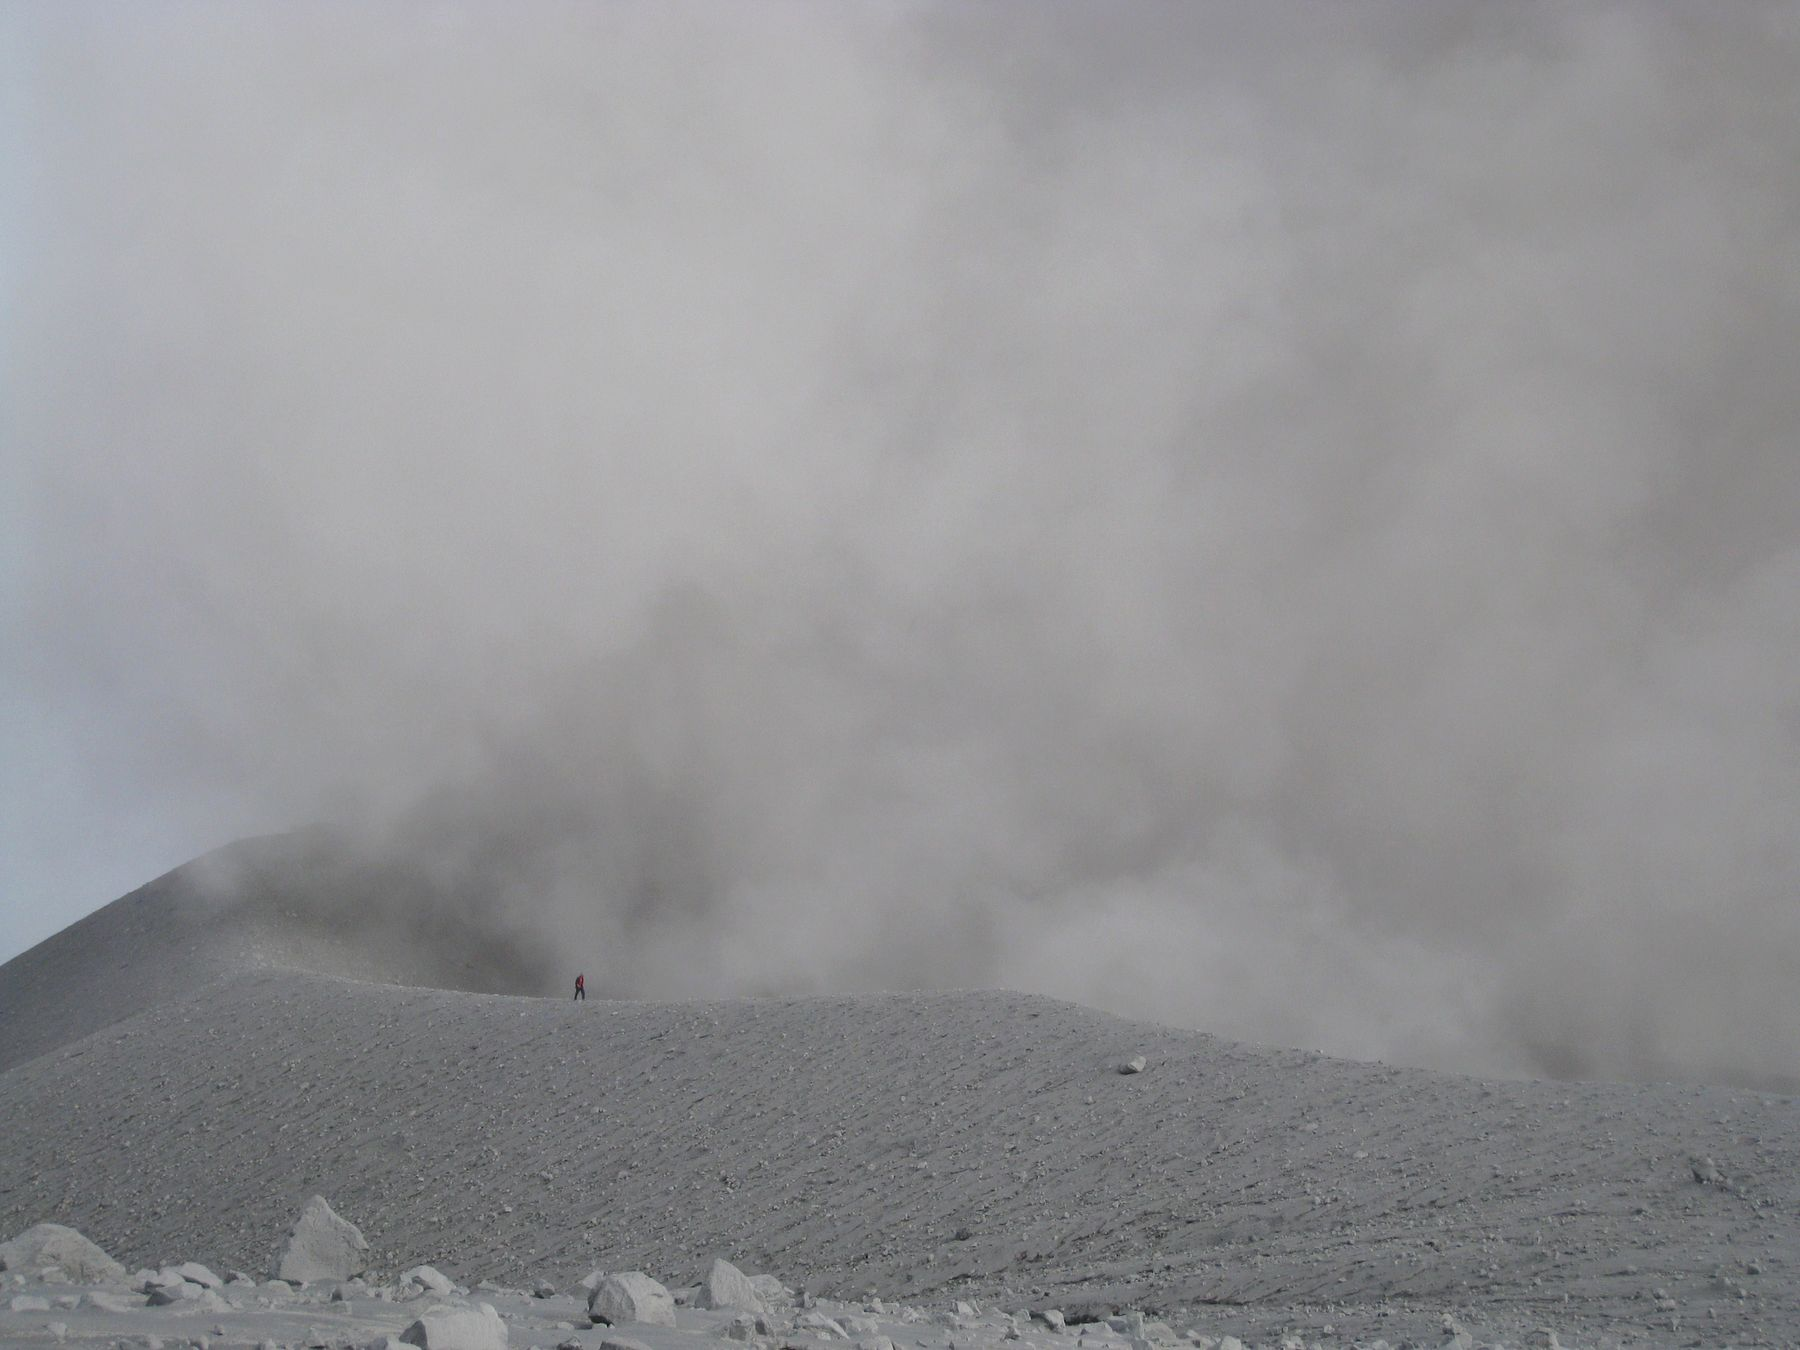 Человек на кромке кратера вулкана Семеру, для масштаба. Индонезия вулкан кратер горы скалы